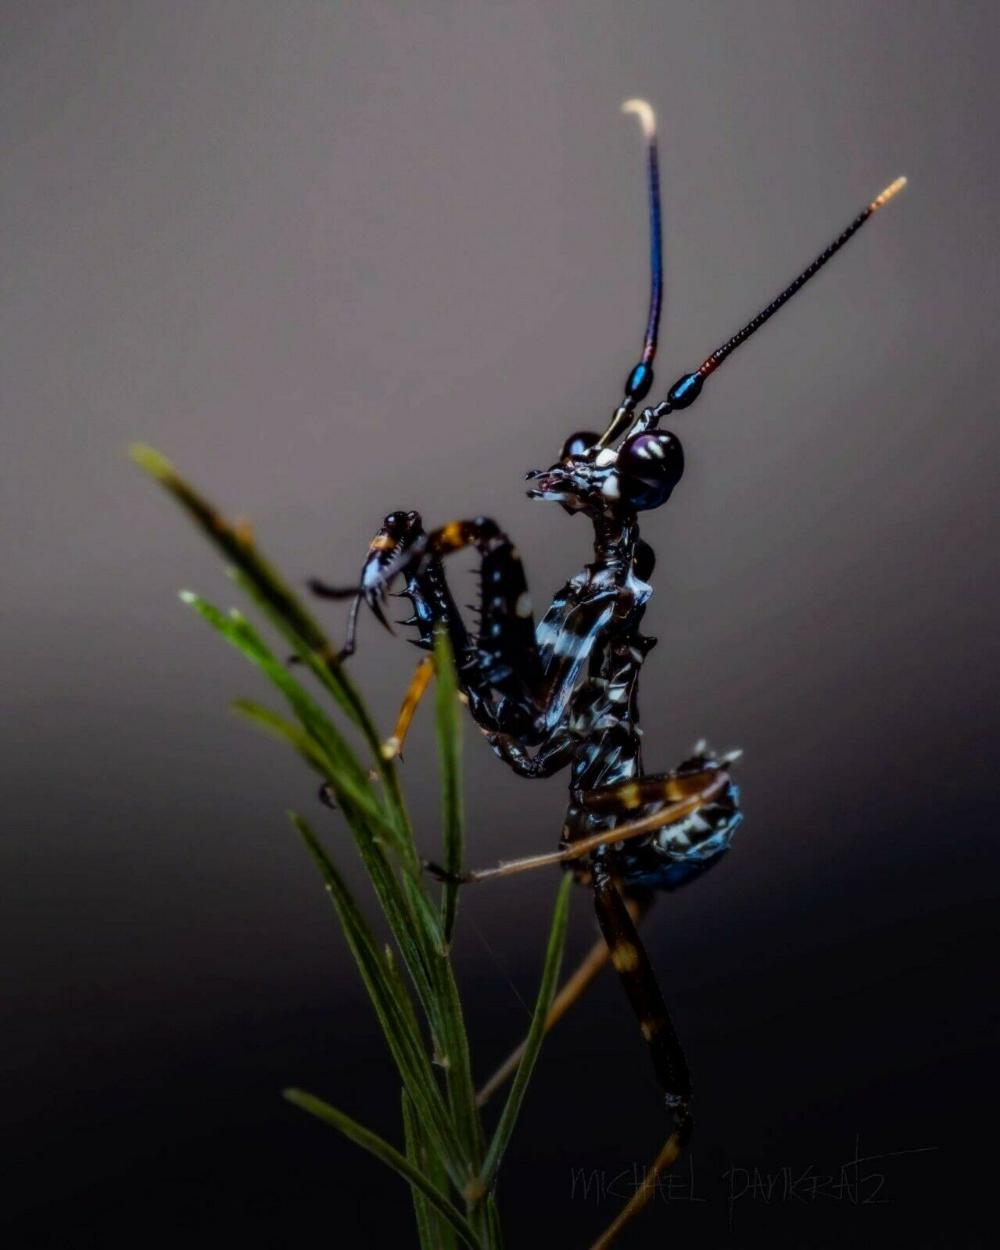 Psuedocreobotra Wahlbergii Spiny Flower Praying Mantis L3 5